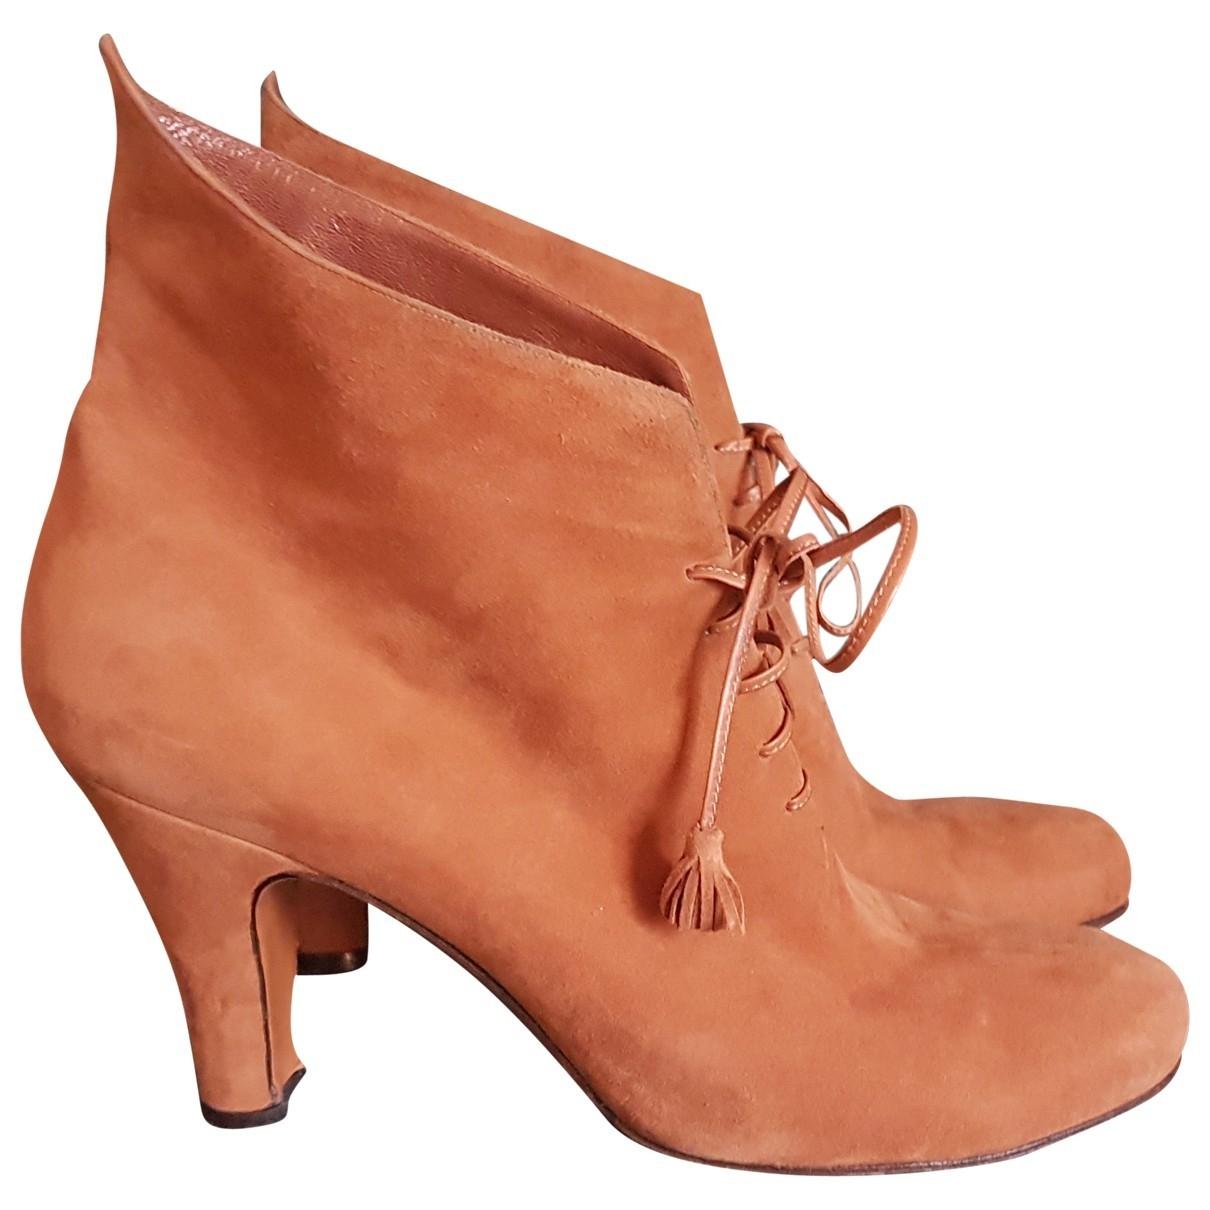 Salvatore Ferragamo \N Camel Suede Ankle boots for Women 40 EU